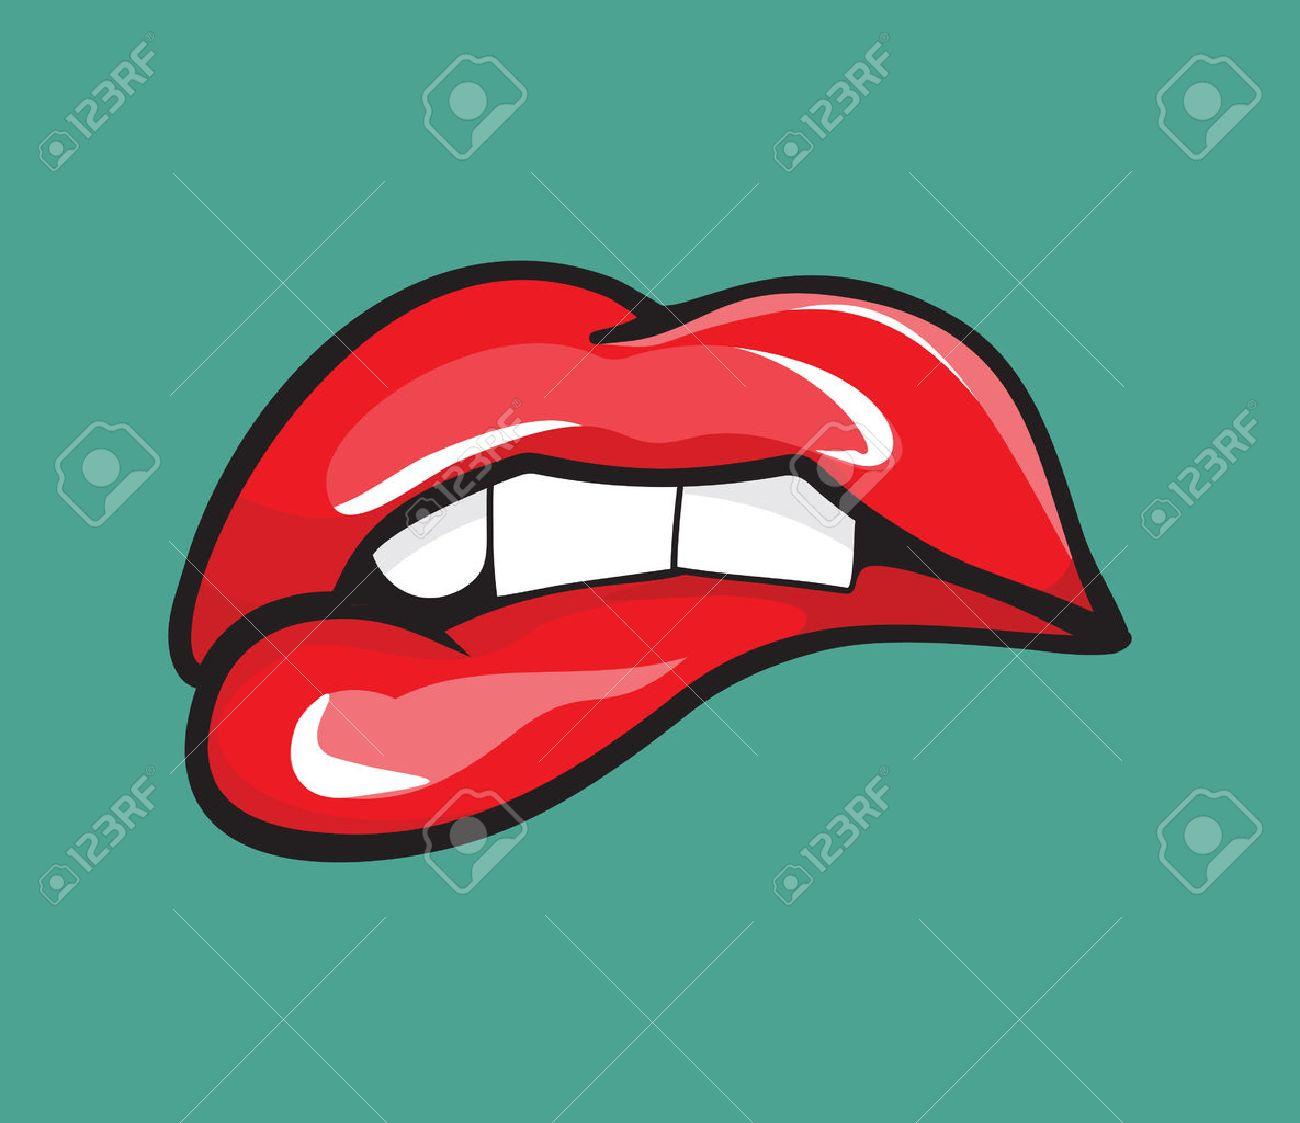 Biting her red lips teeth pop art - 38127398